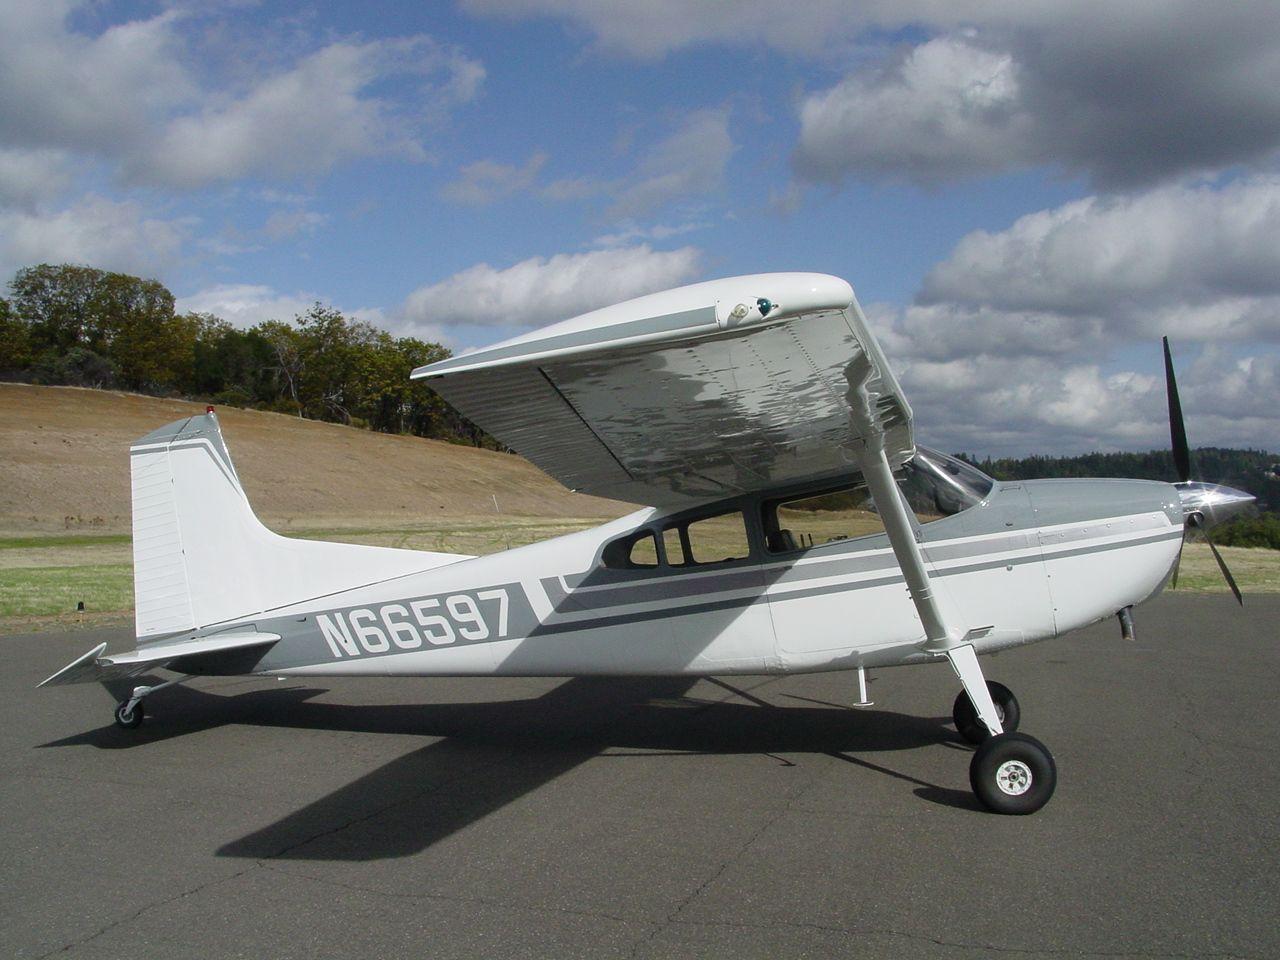 Cessna 180 Cessna, Radio control airplane, Radio control